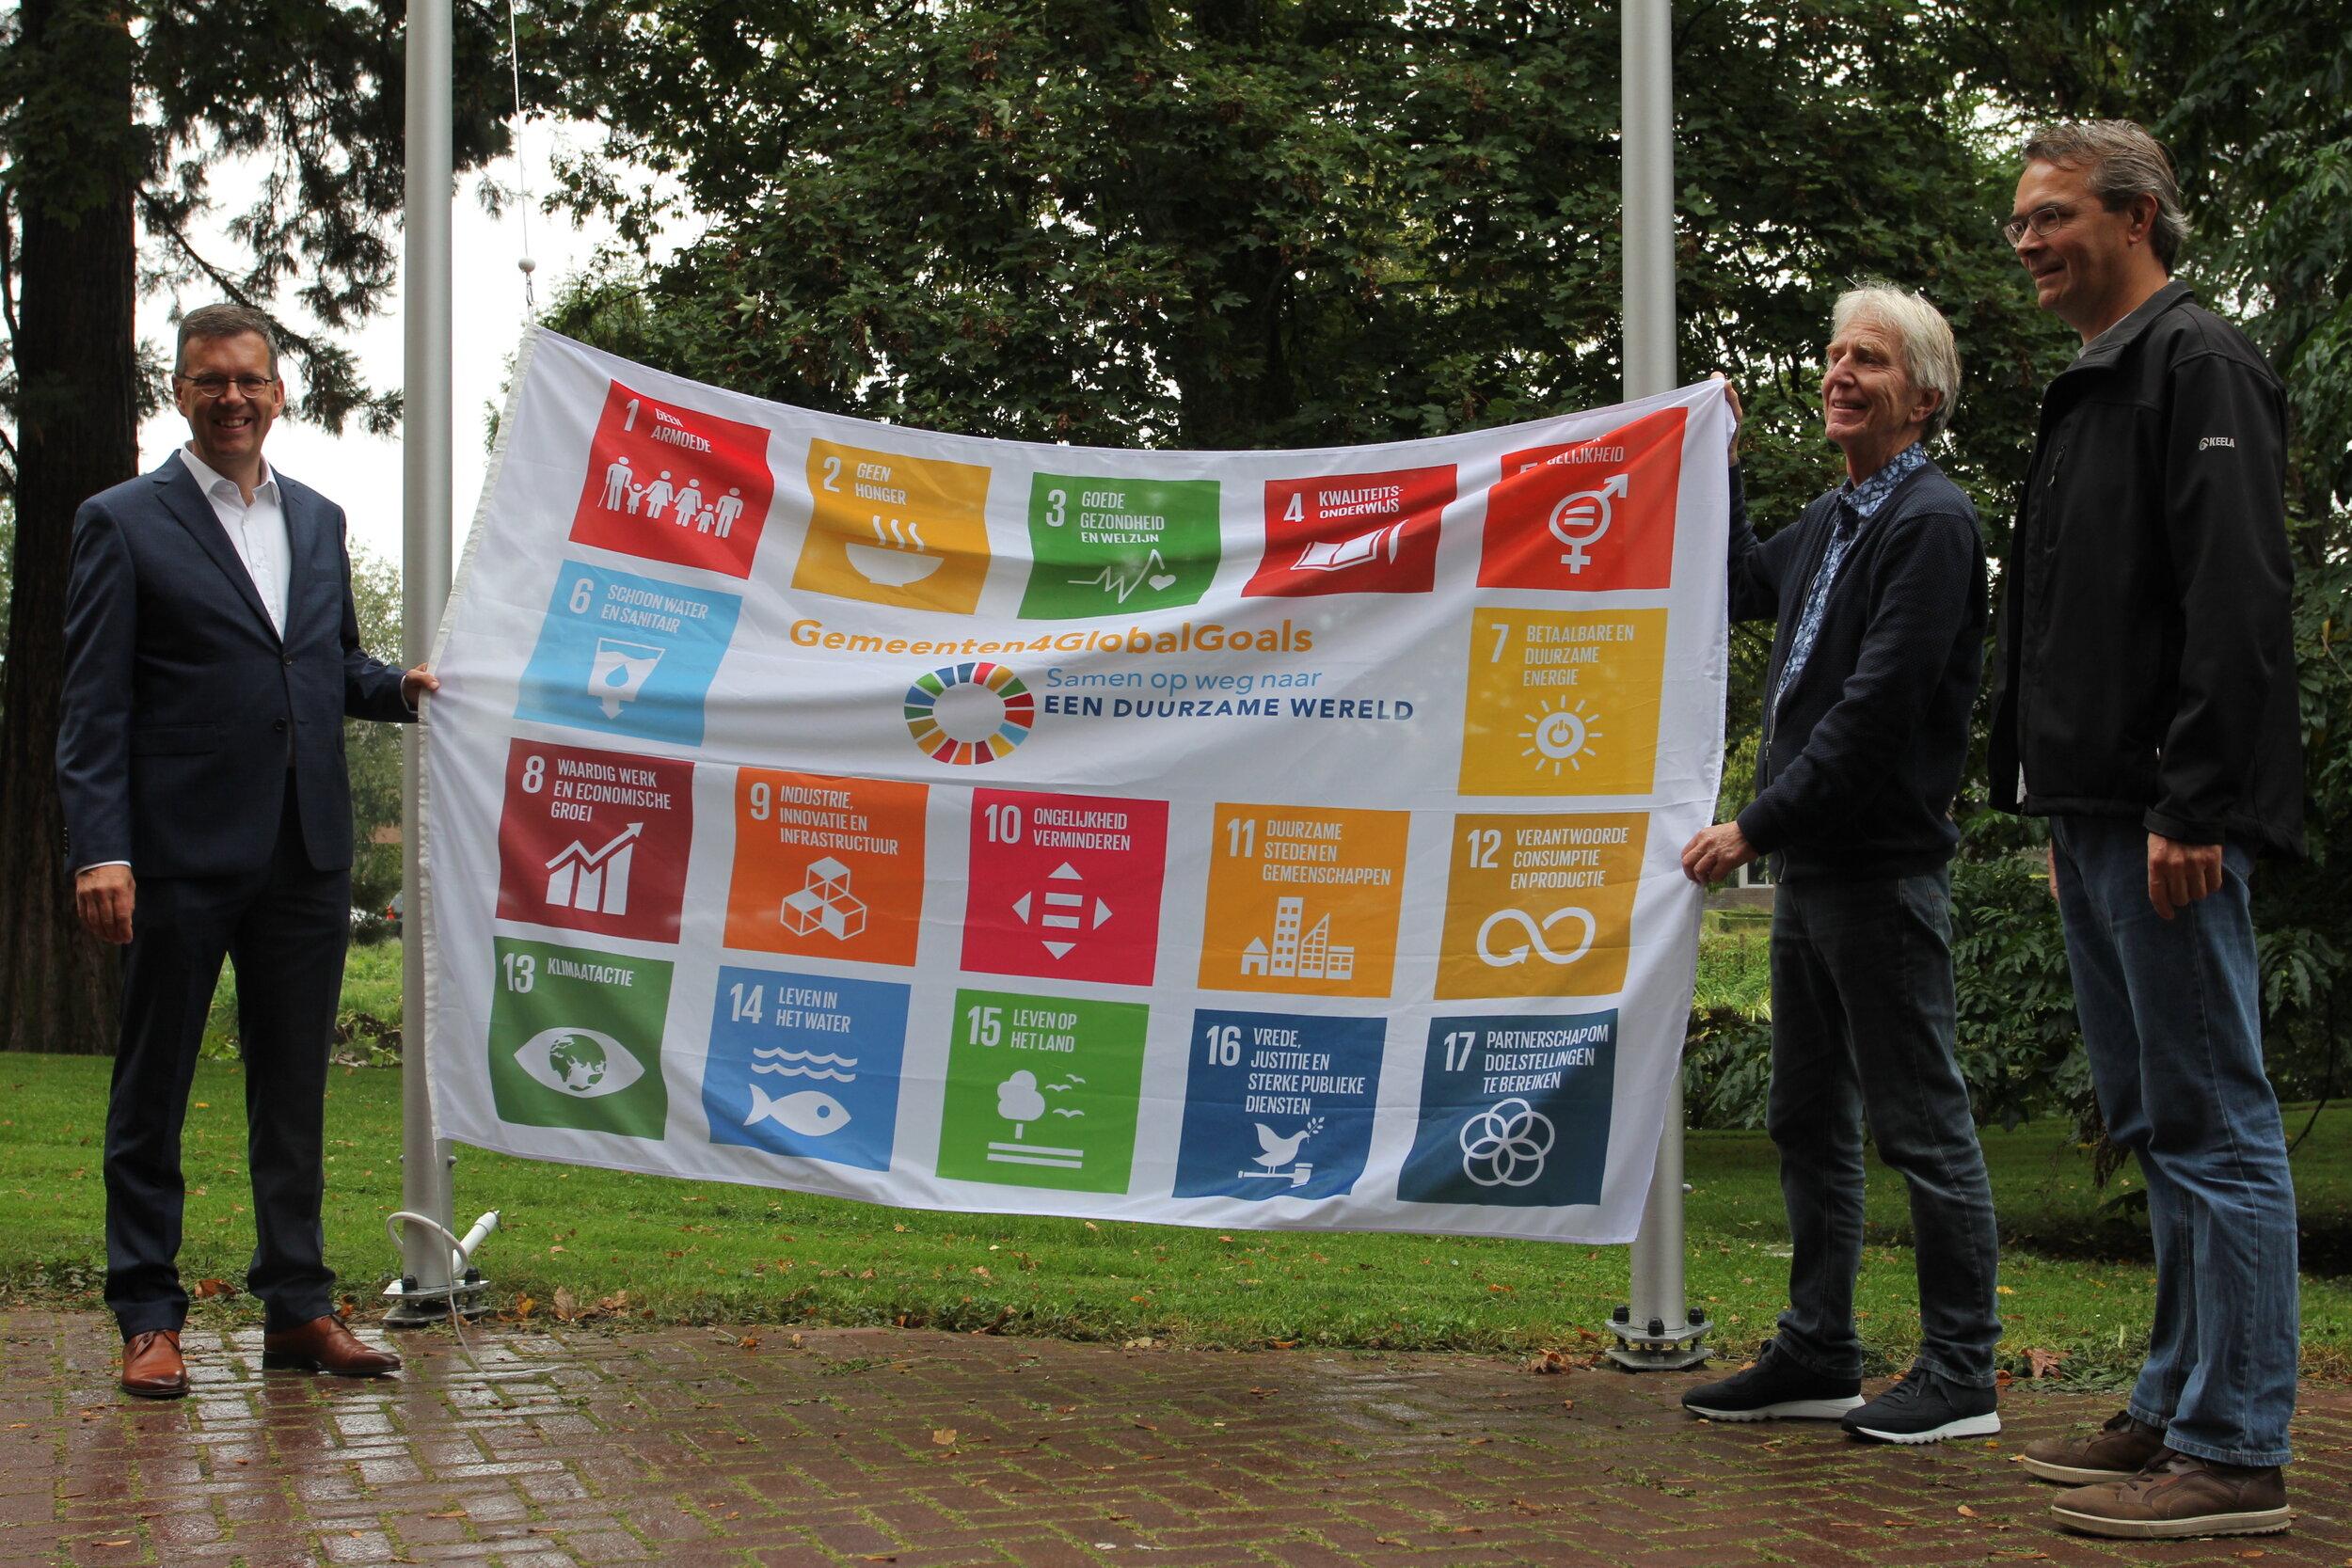 Global Goals in Culemborg